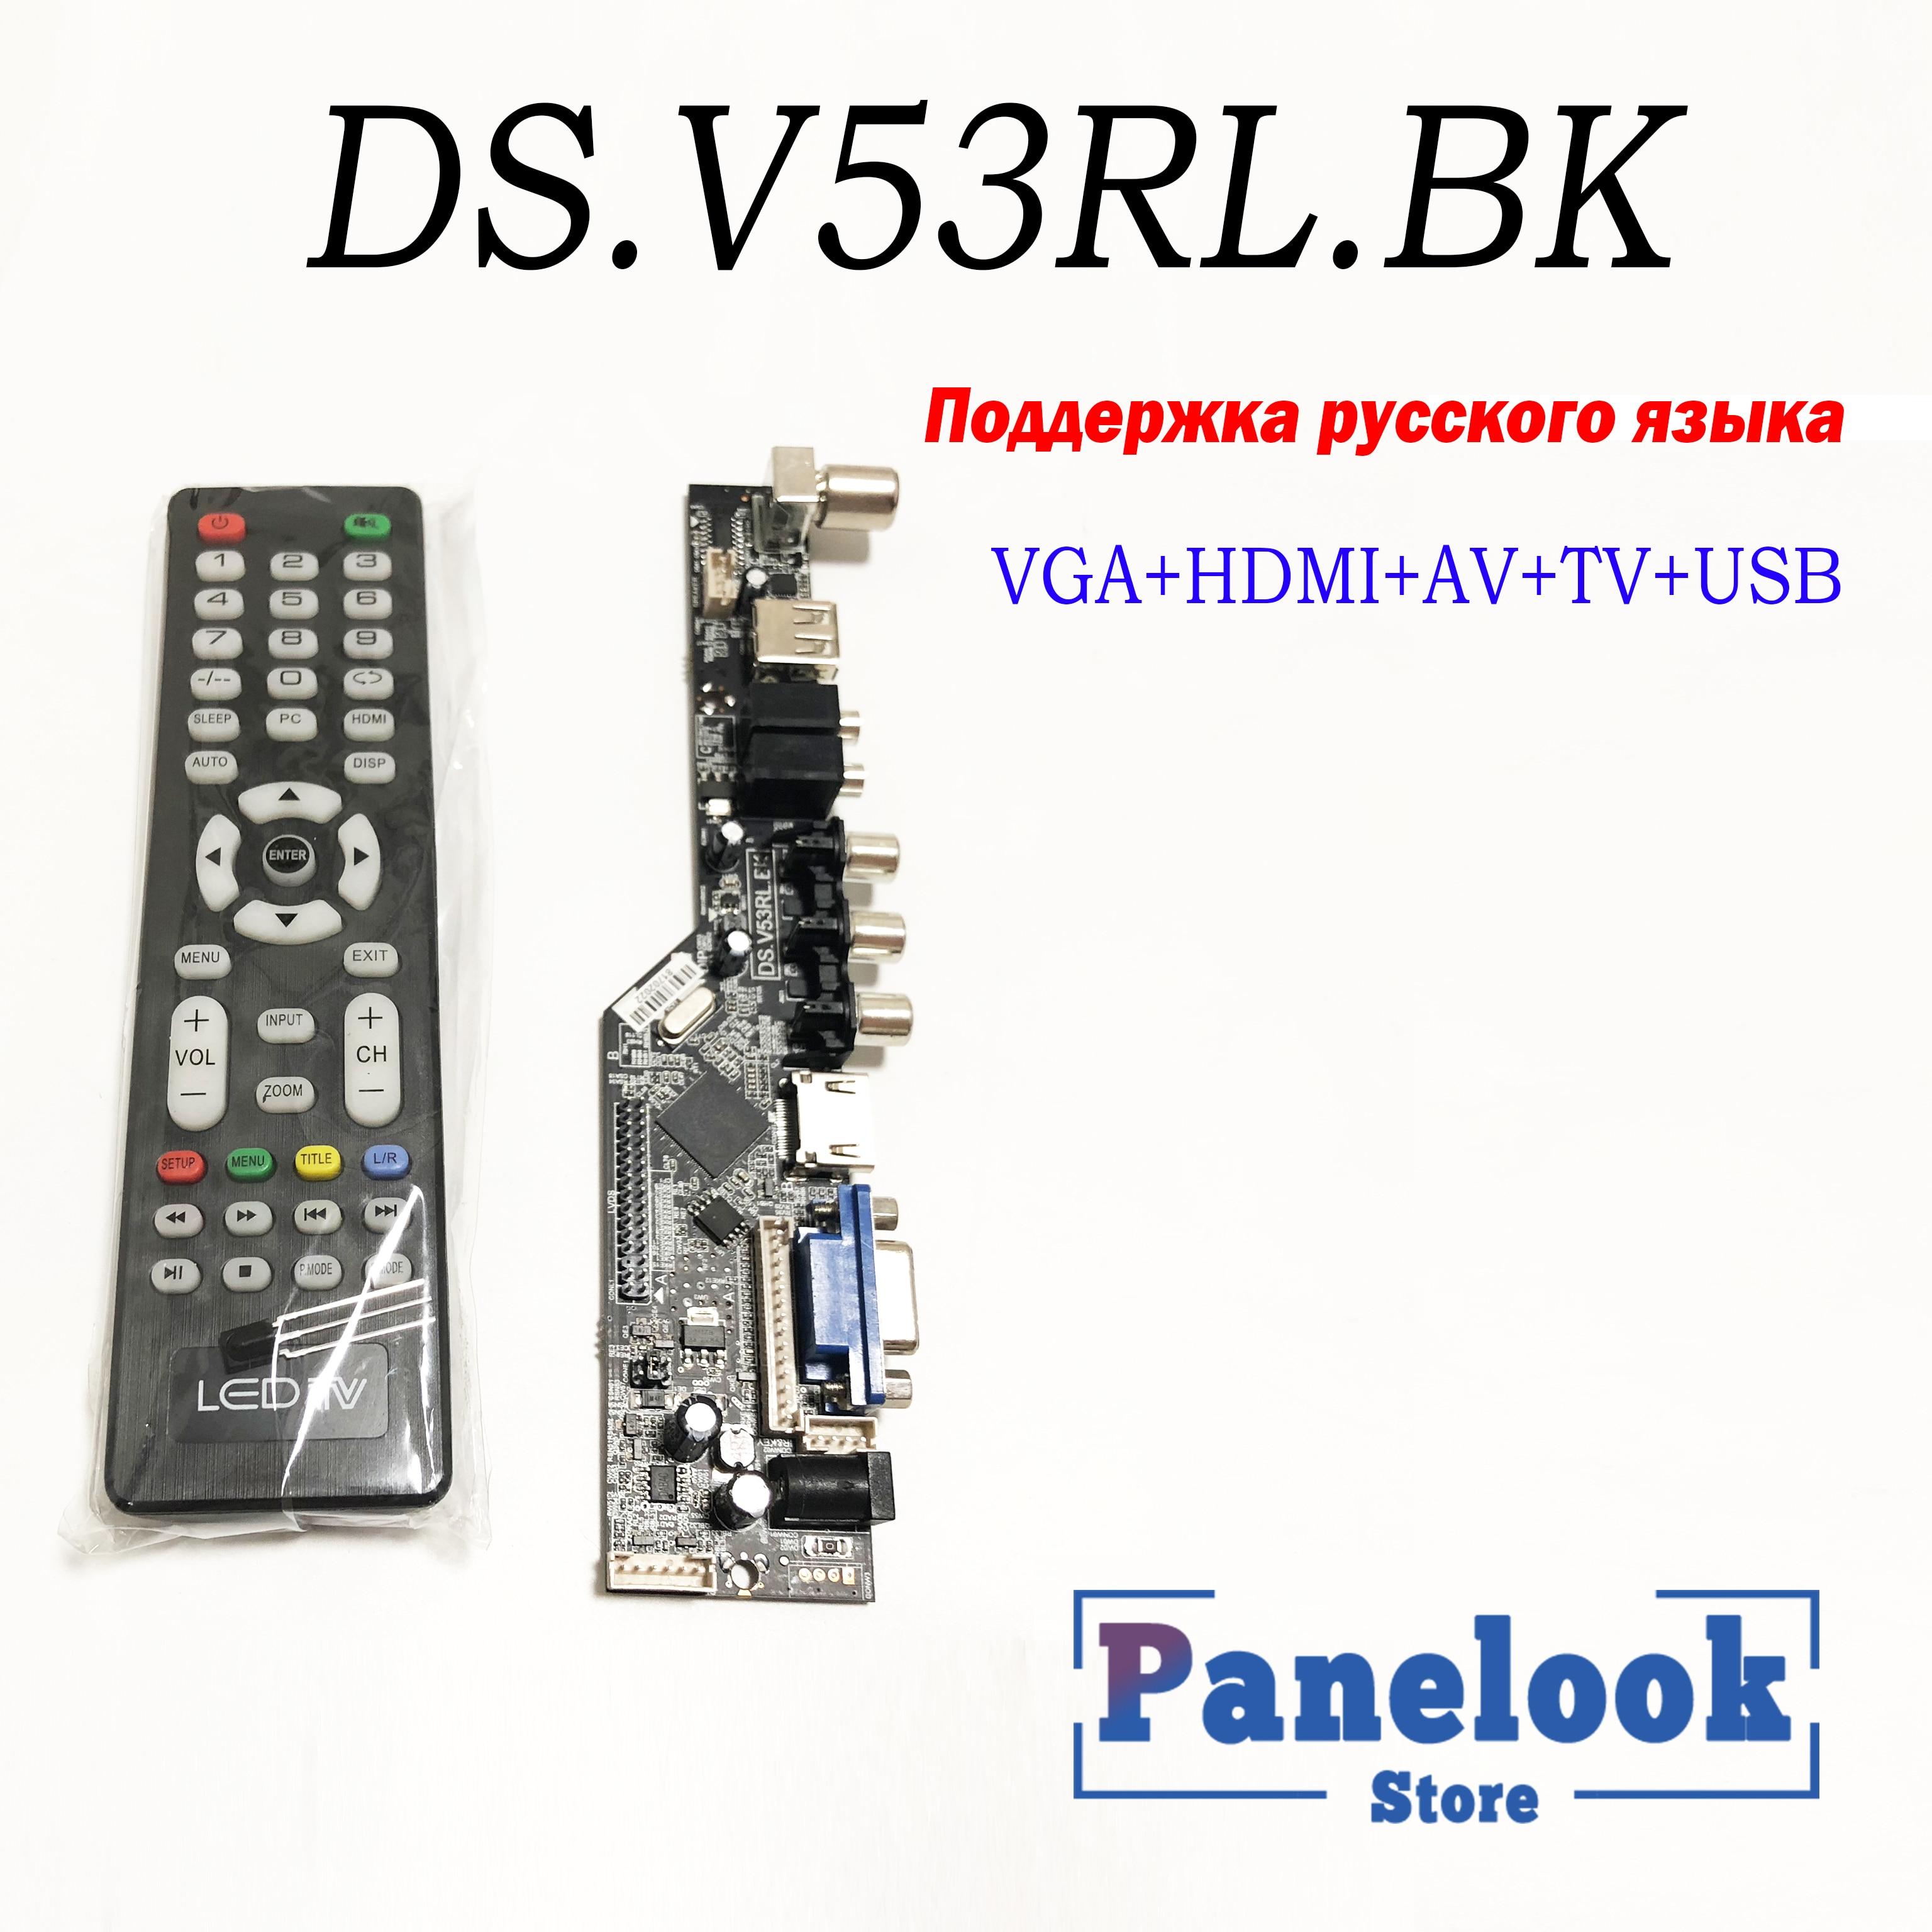 V53 DS.V53RL DS.V53RL.BK Universal LCD TV Controller Driver Board PC/VGA/HDMI/USB Interface